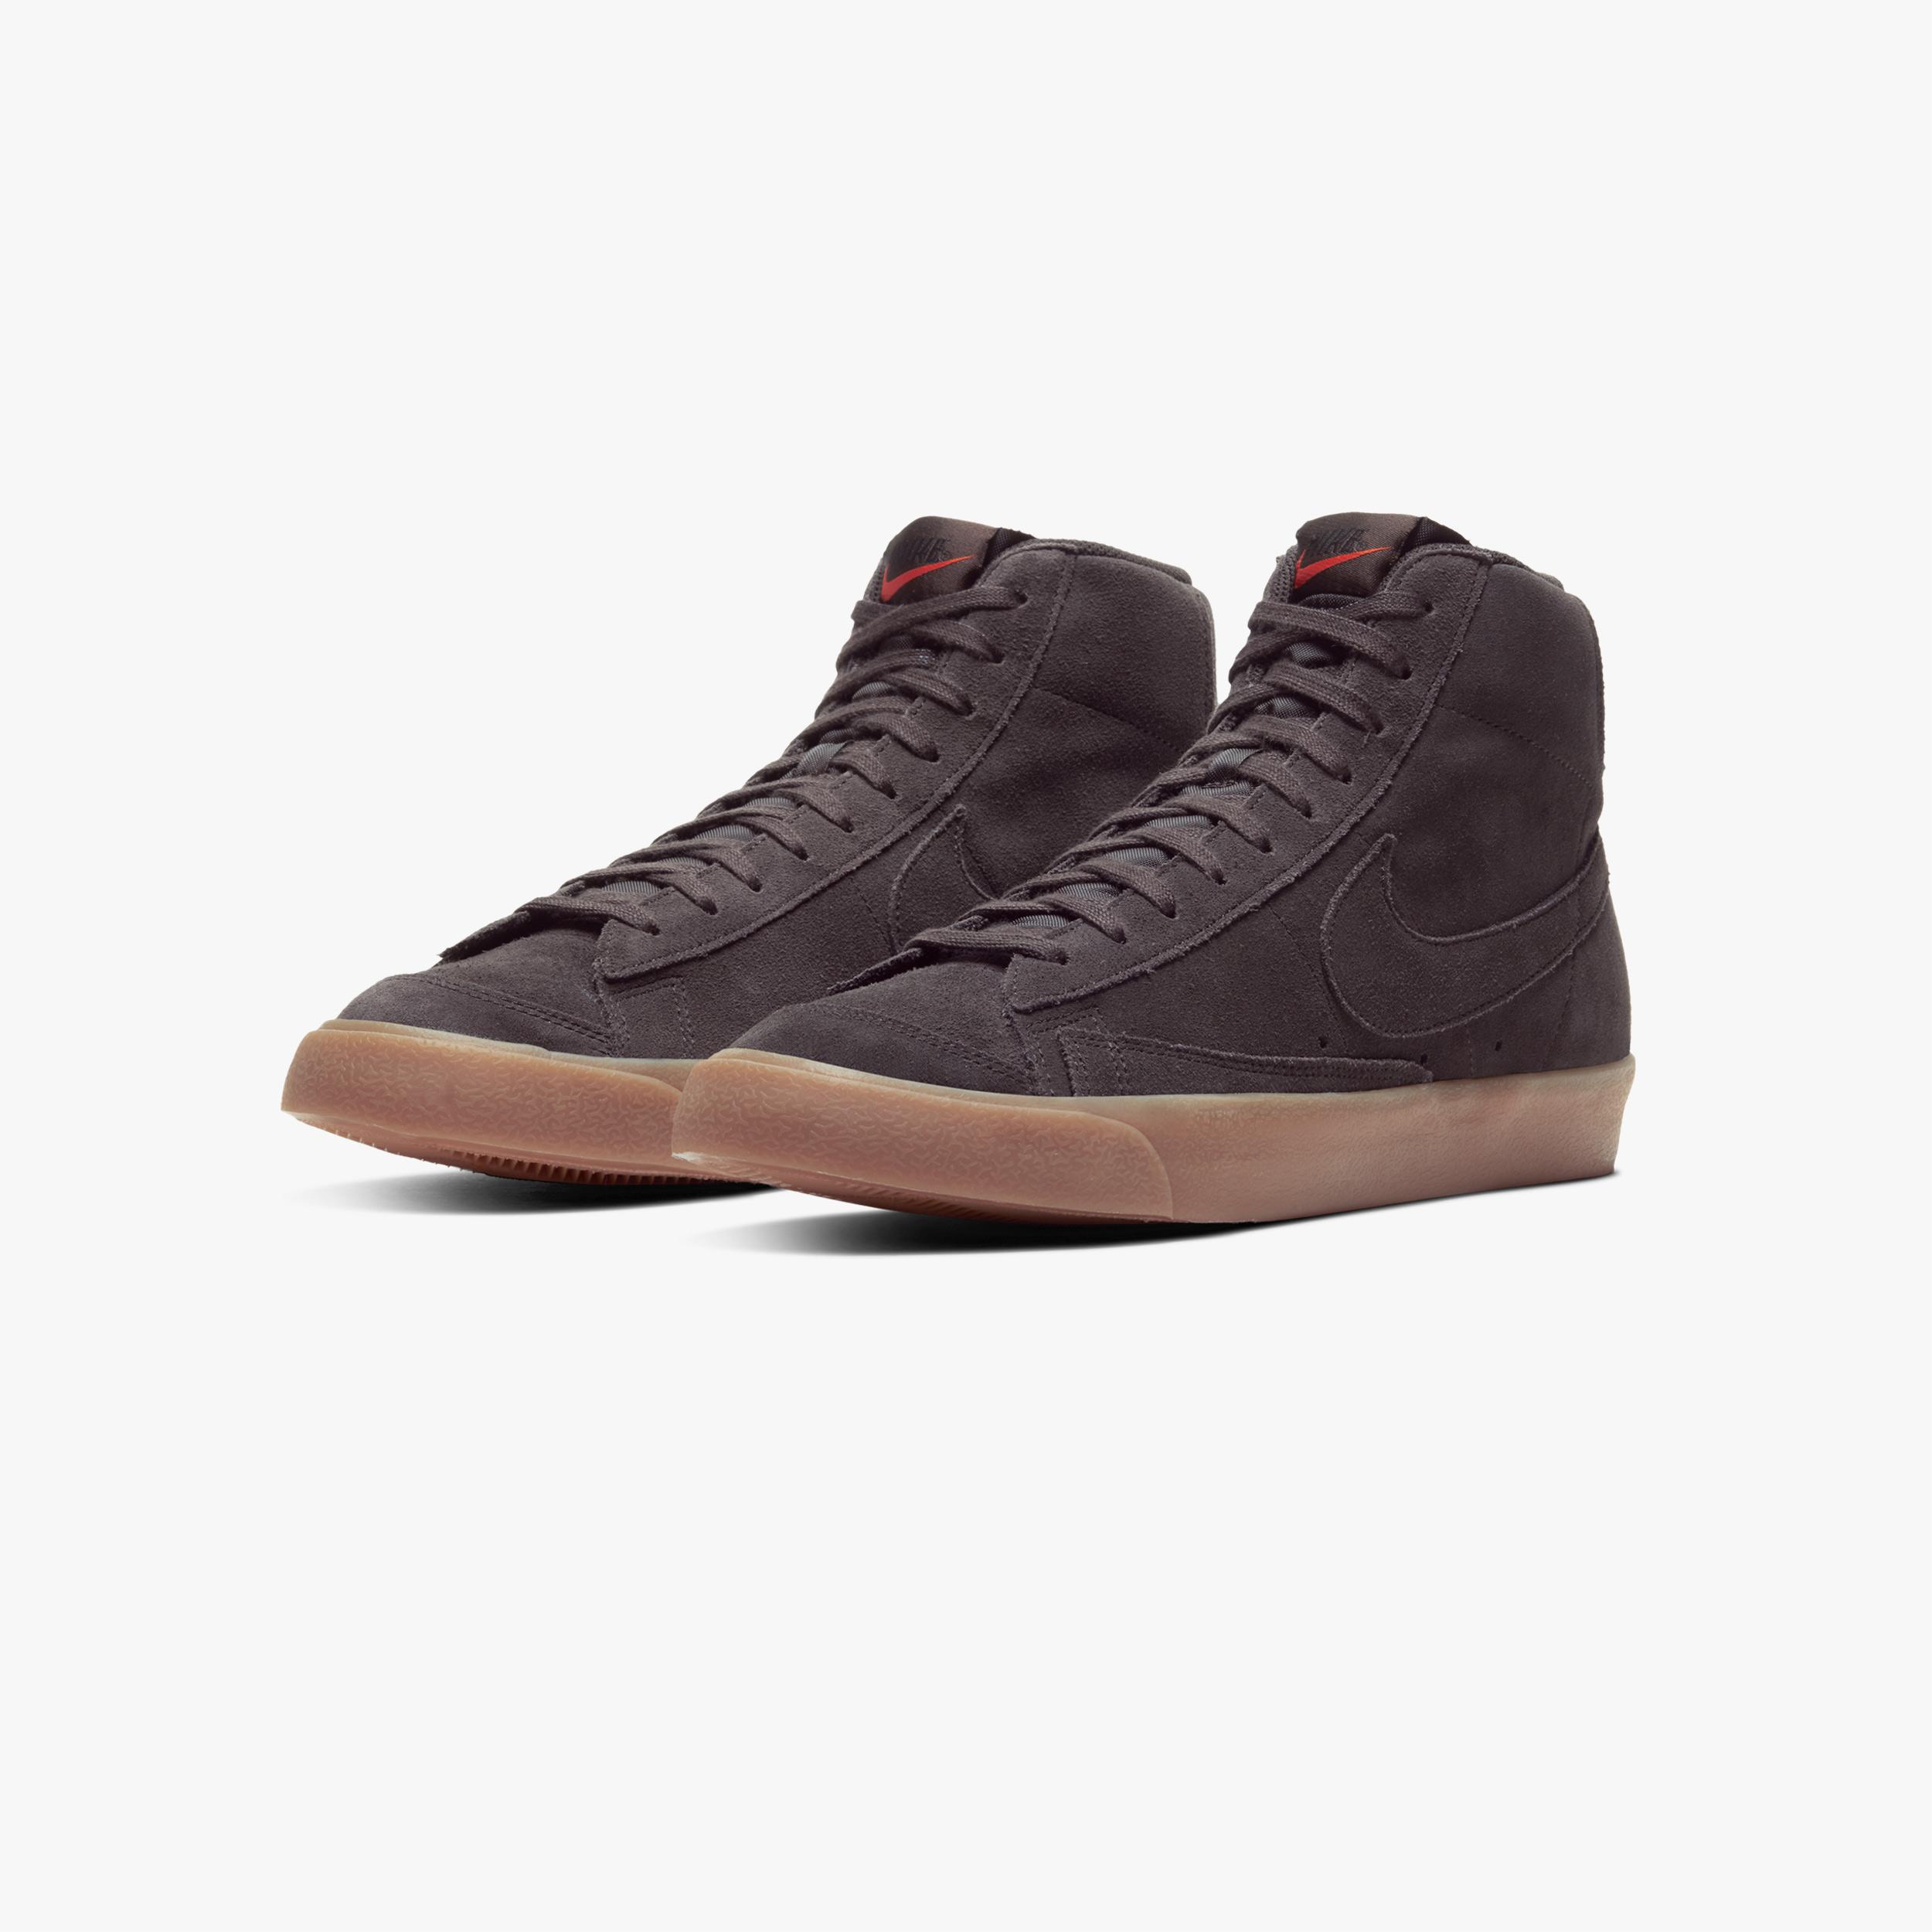 Nike Blazer Mid 77 Suede - Ci1172-200 - SNS | sneakers ...